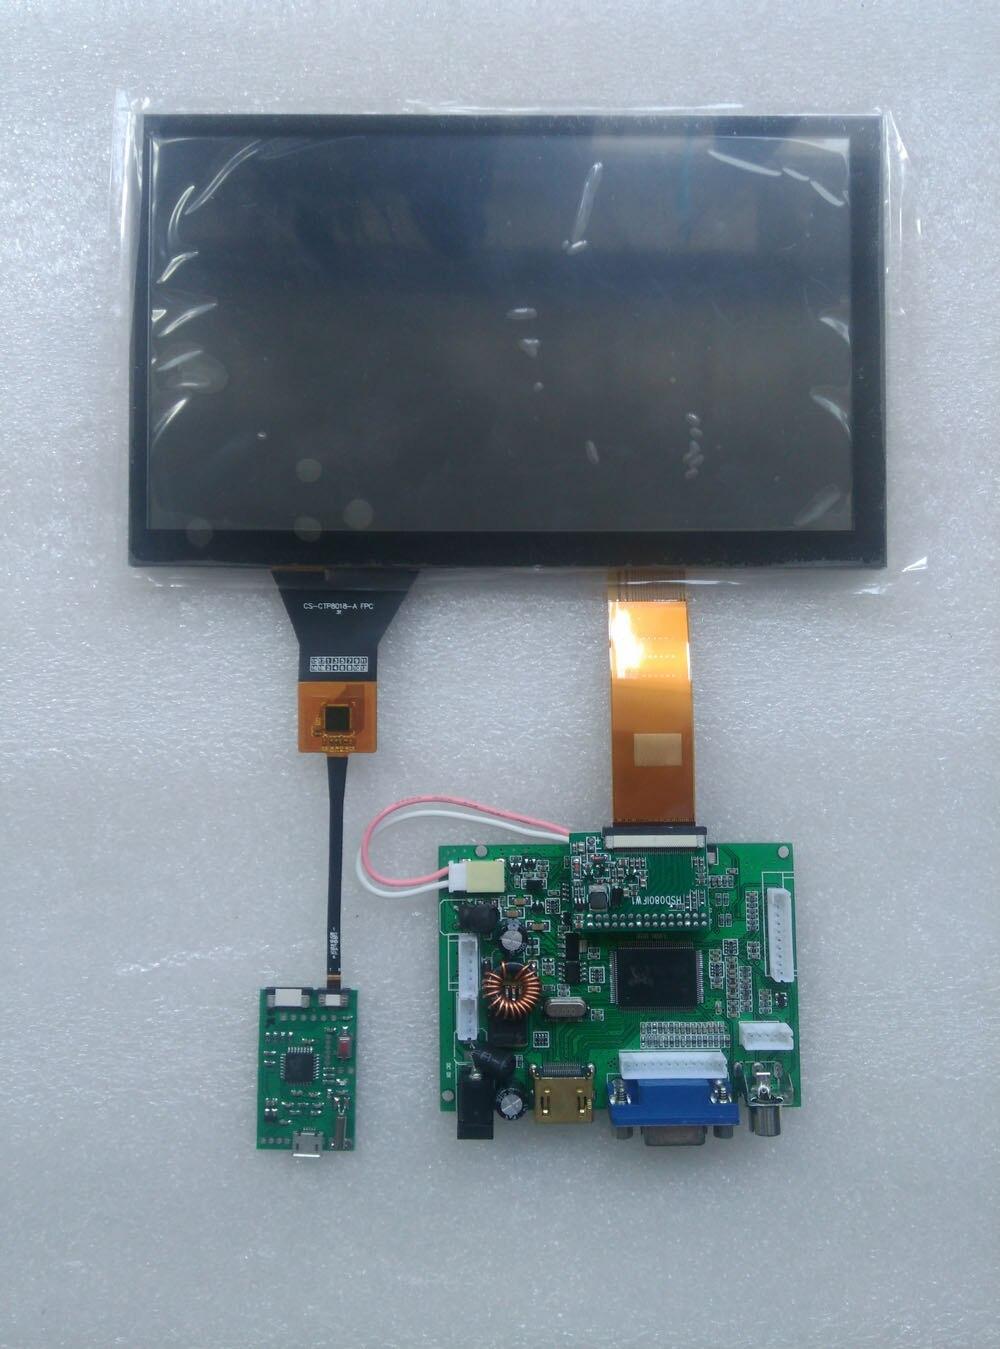 CARPC Kit 8' 1024 600 LCD Hohe Helligkeit WIN7 WIN8 WIN10 Android Kapazitiven Touchscreen HDMI + VGA + 2AV umkehrung Der Priorität